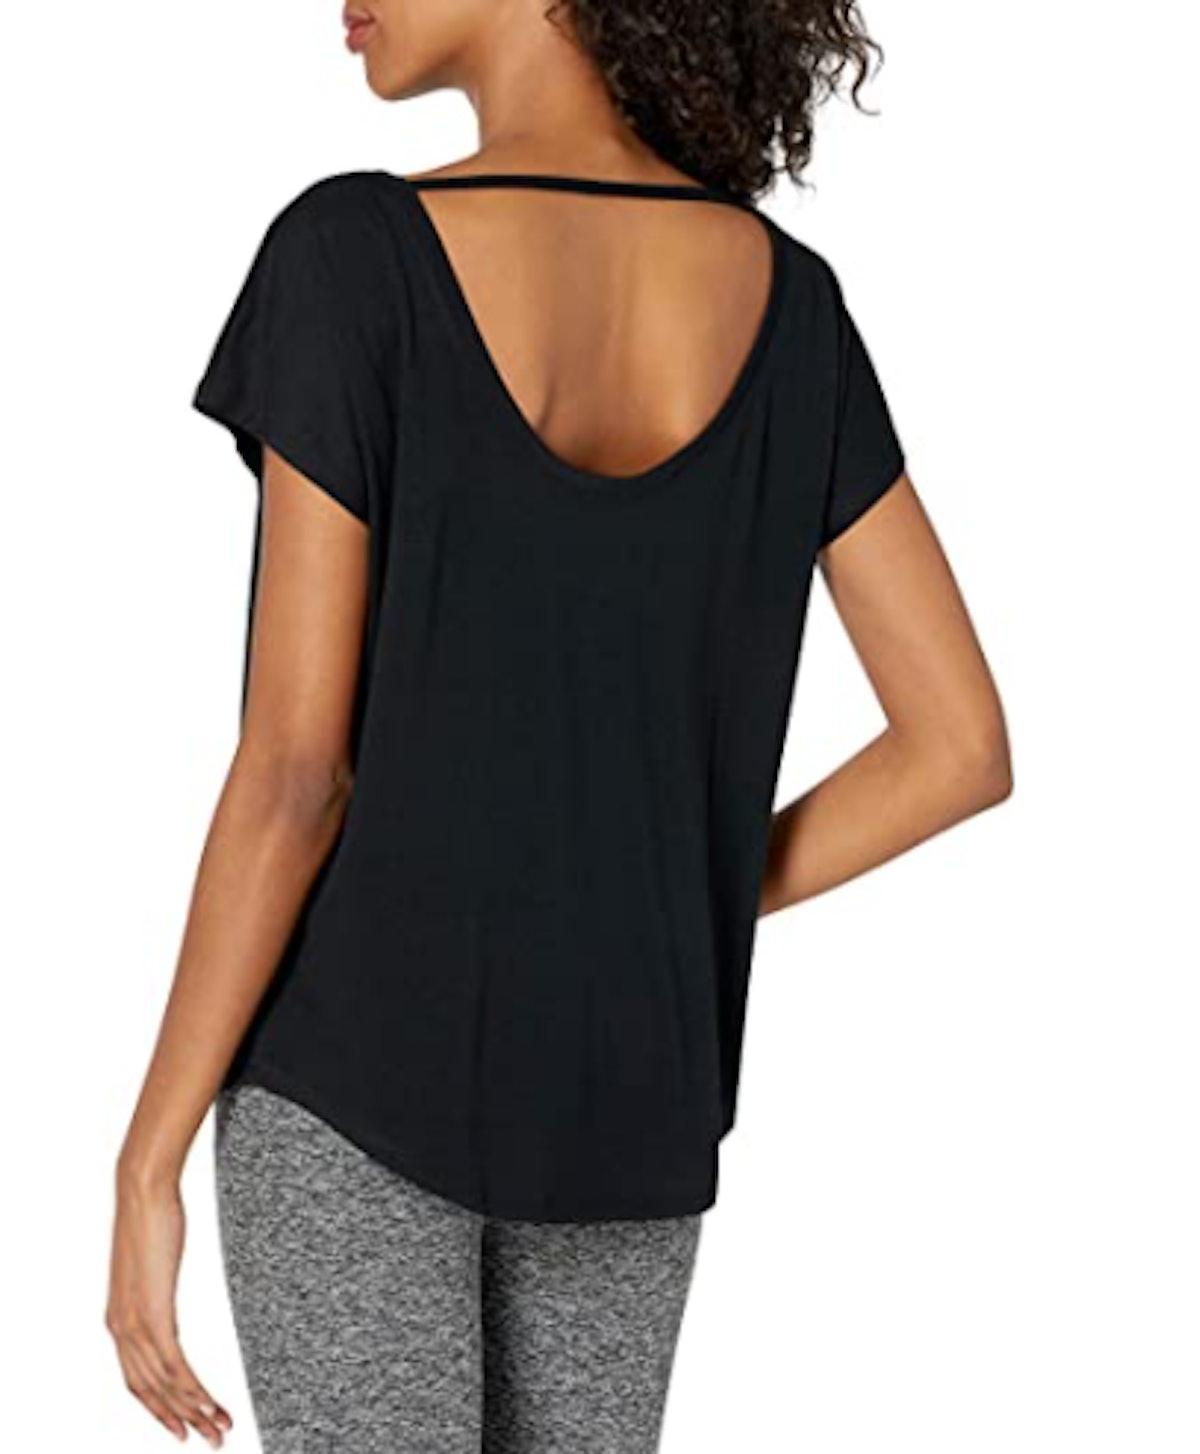 Amazon Essentials Open-Back Shirt